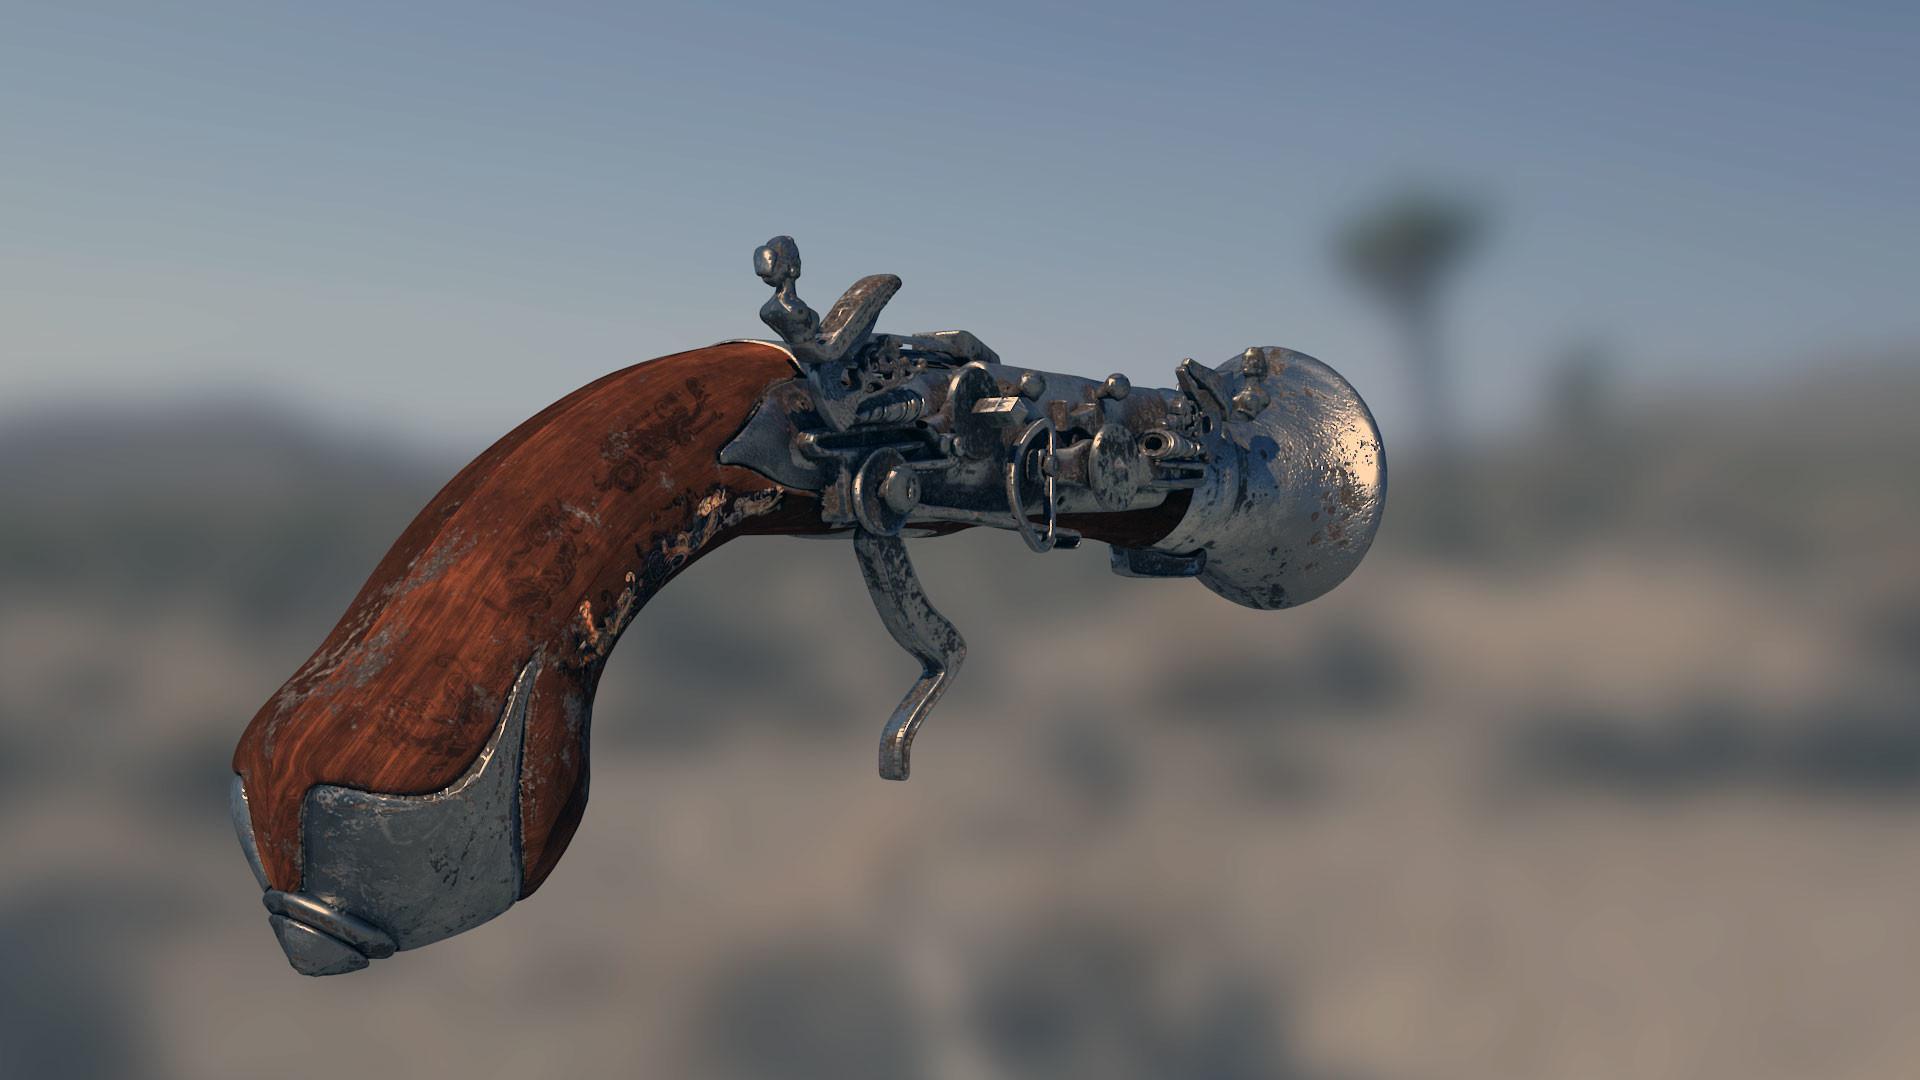 Fabricio rezende render gun 0133